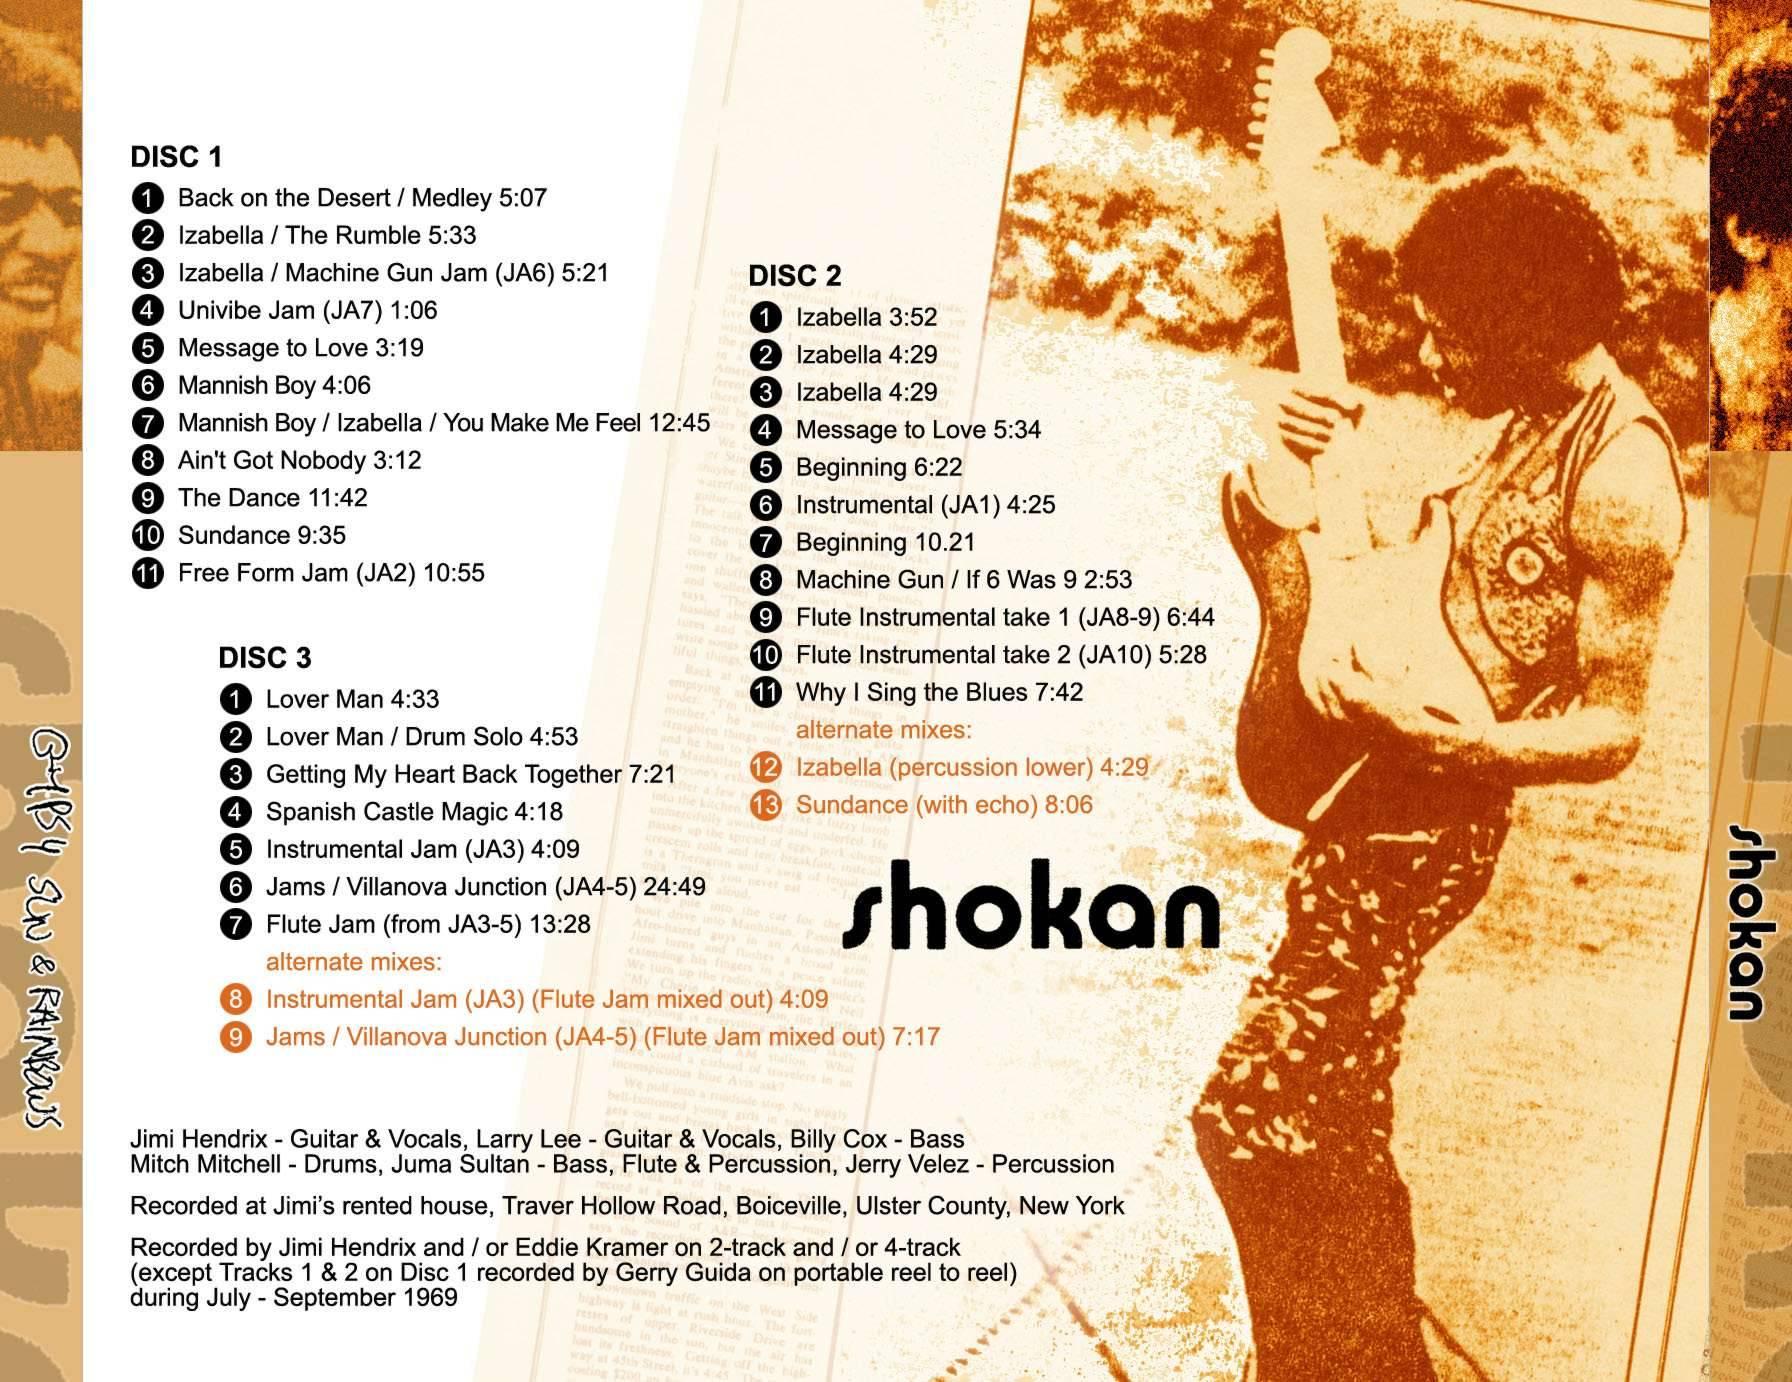 Gypsy Sun And Rainbows: Shokan (ATM 221-223)  Gypsy1-back